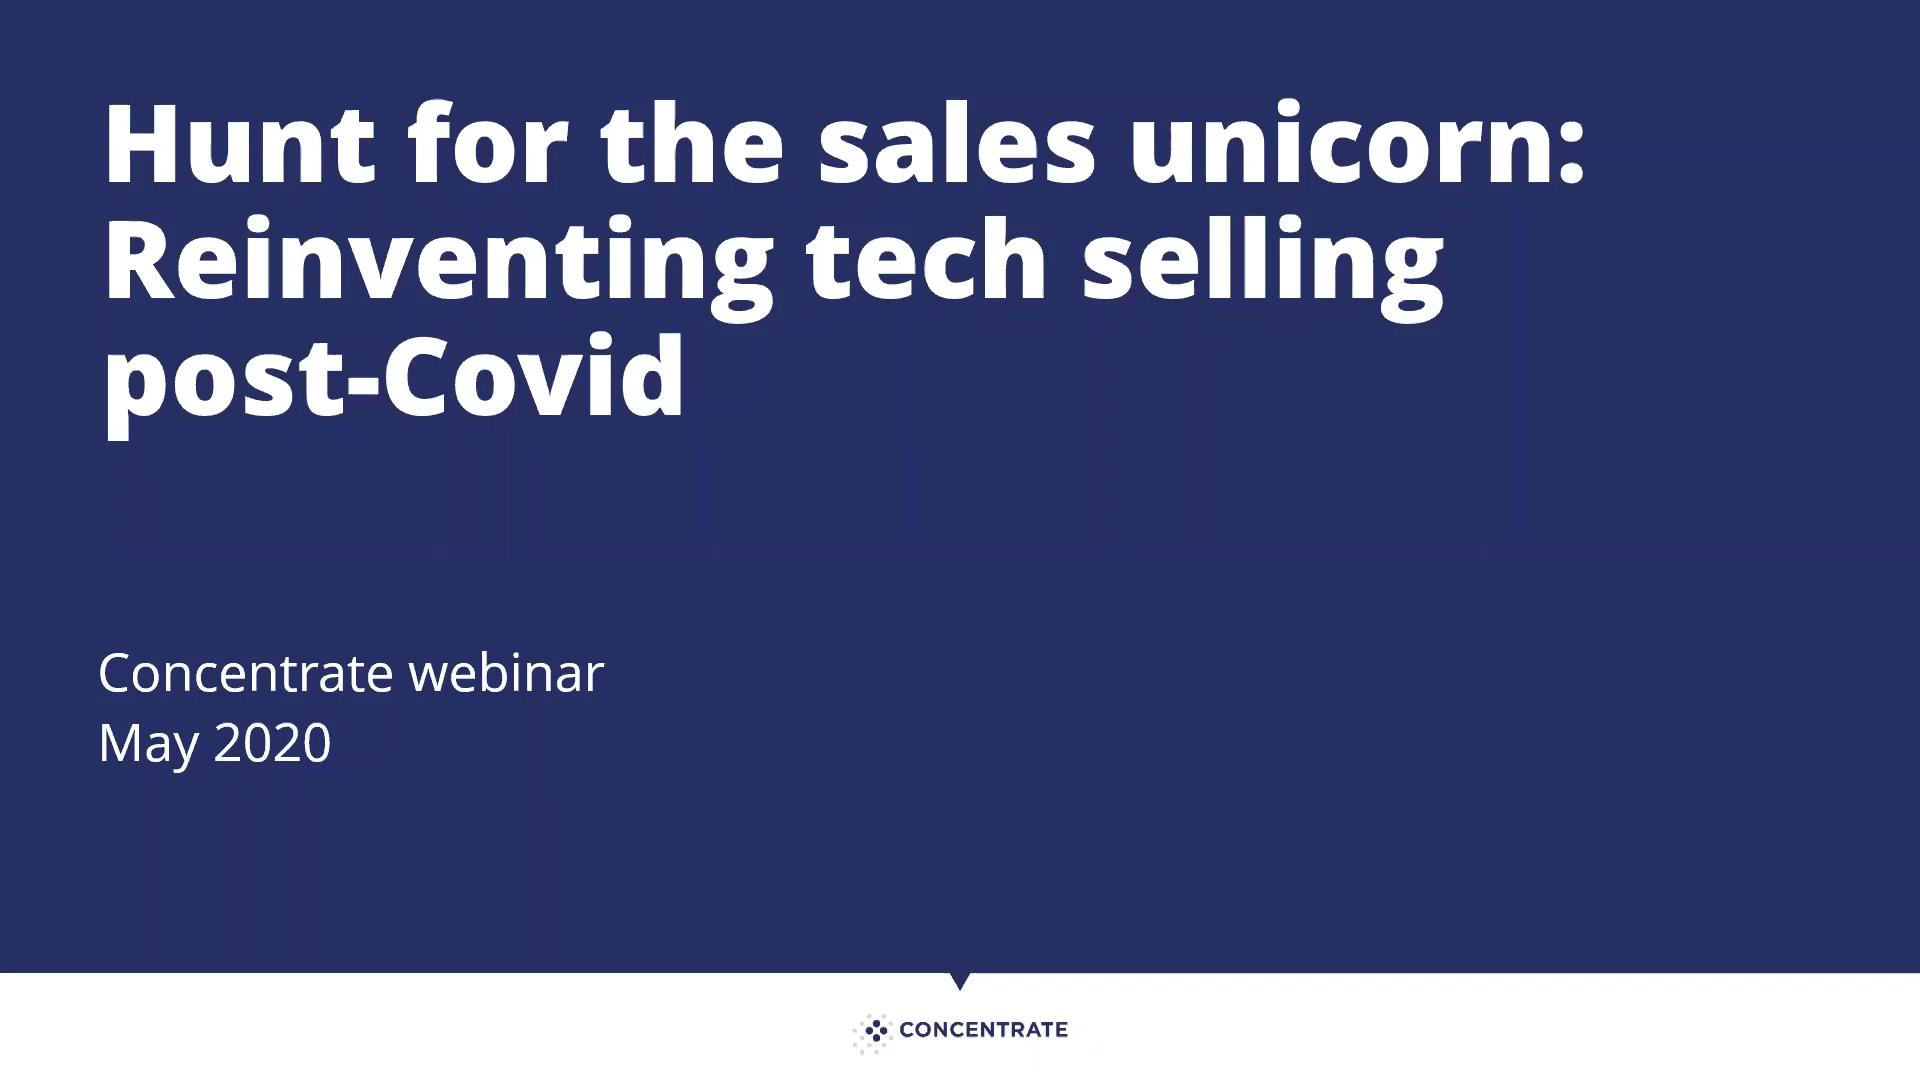 Hunt for the sales unicorn webinar recording-1